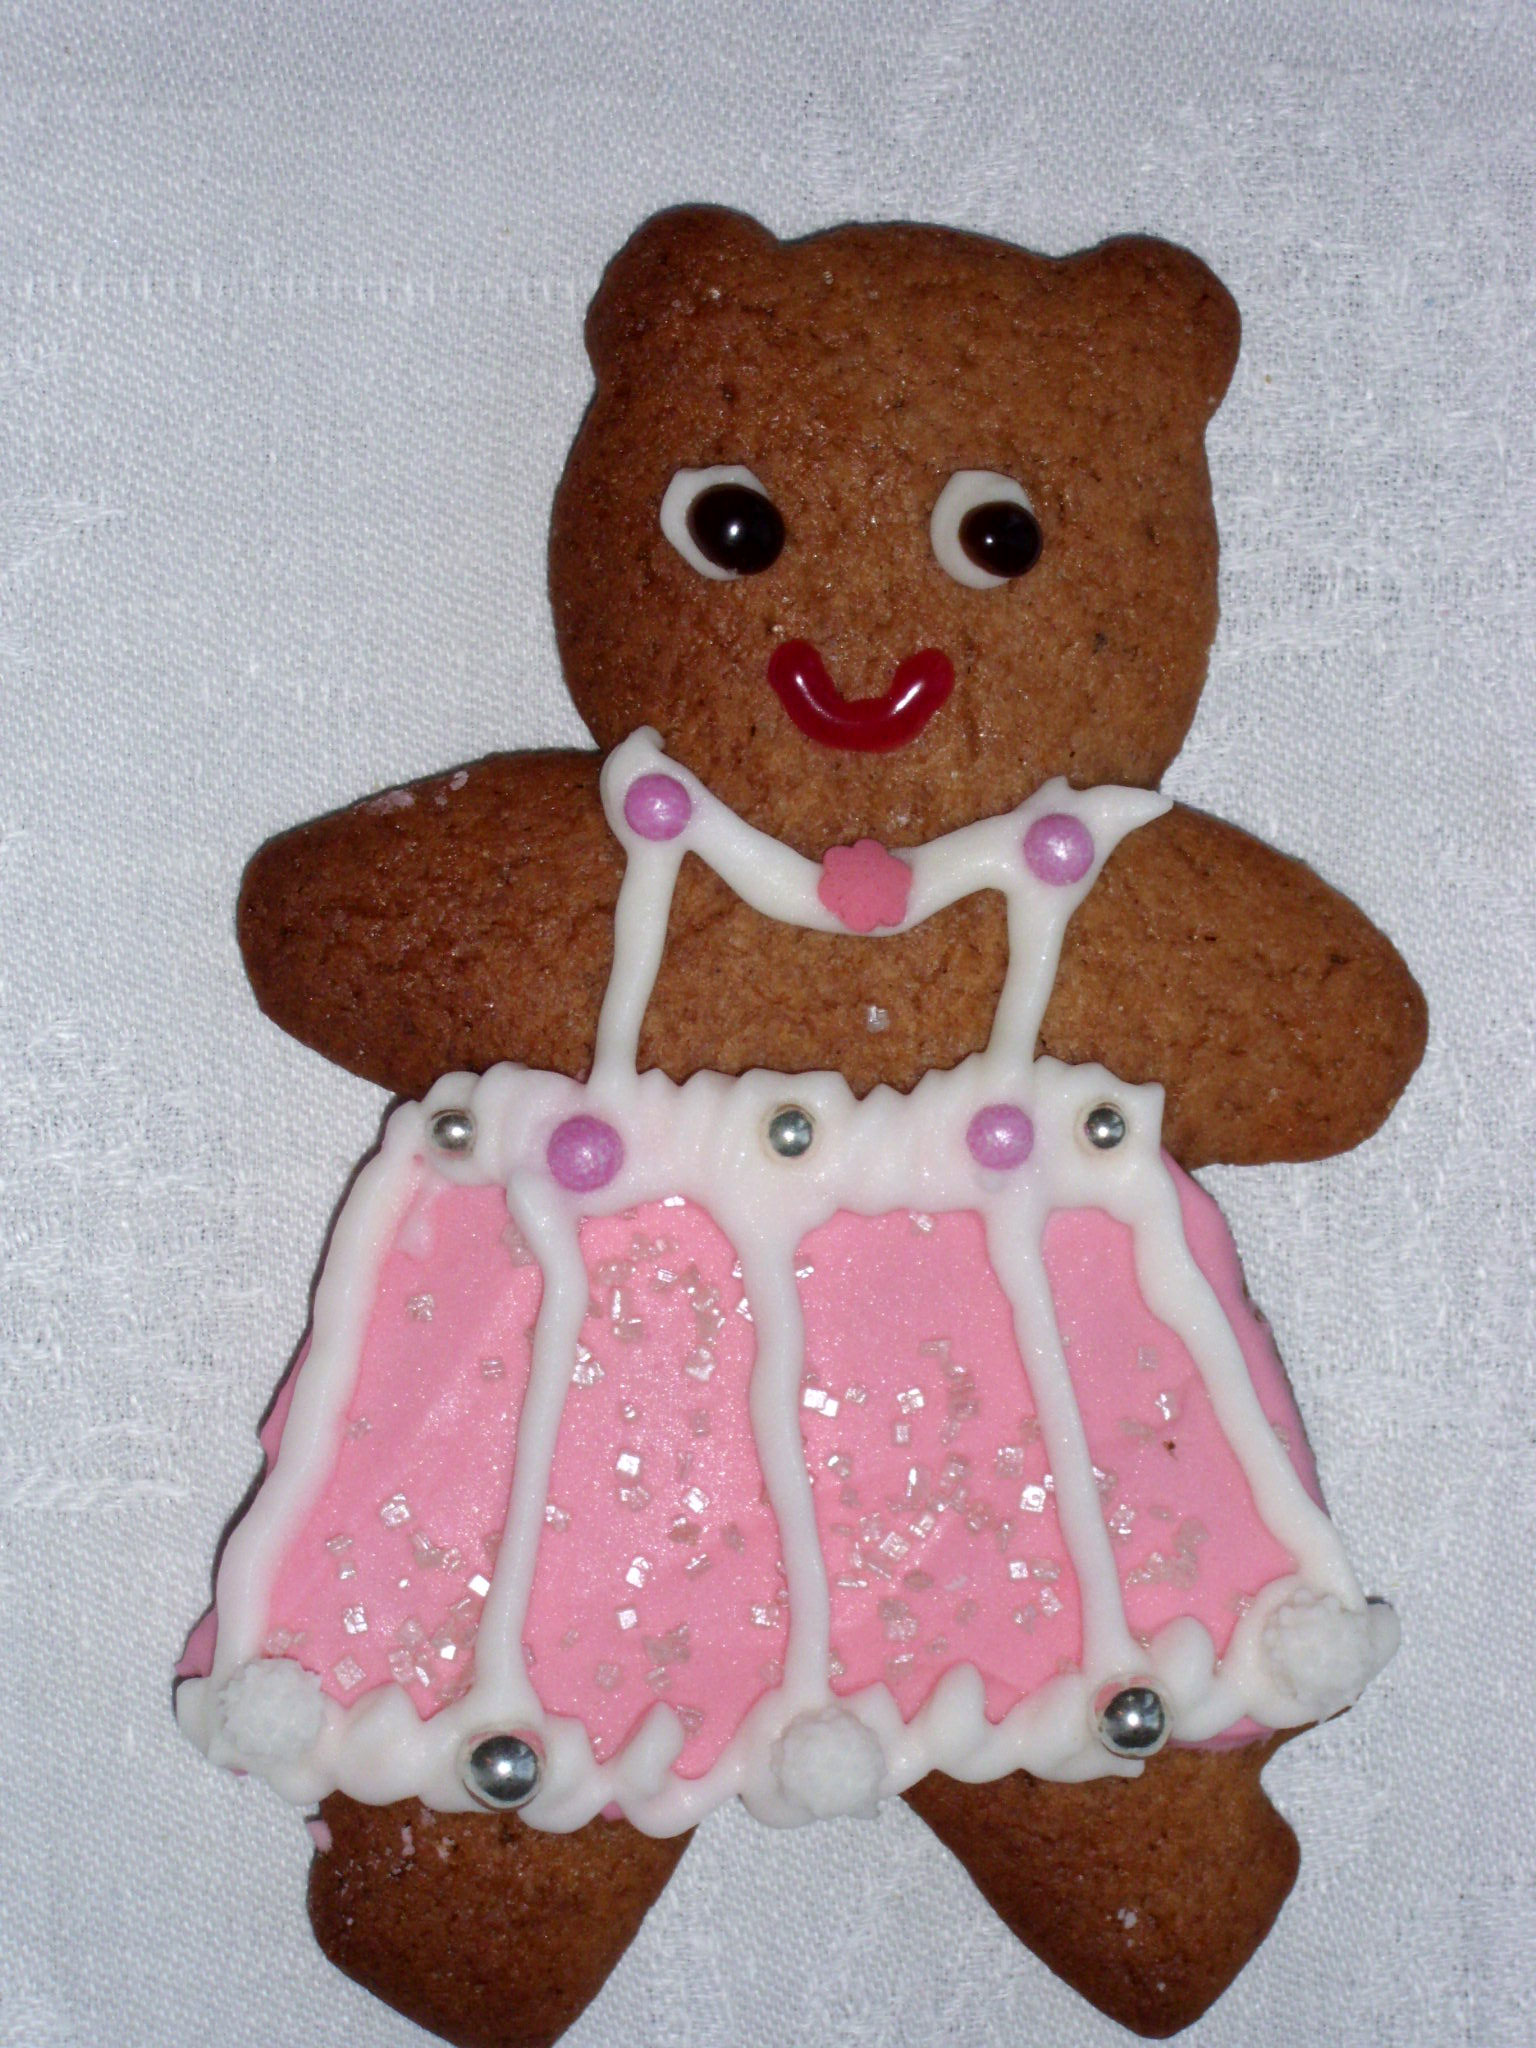 Hausgemachtes Gingerbread Bär